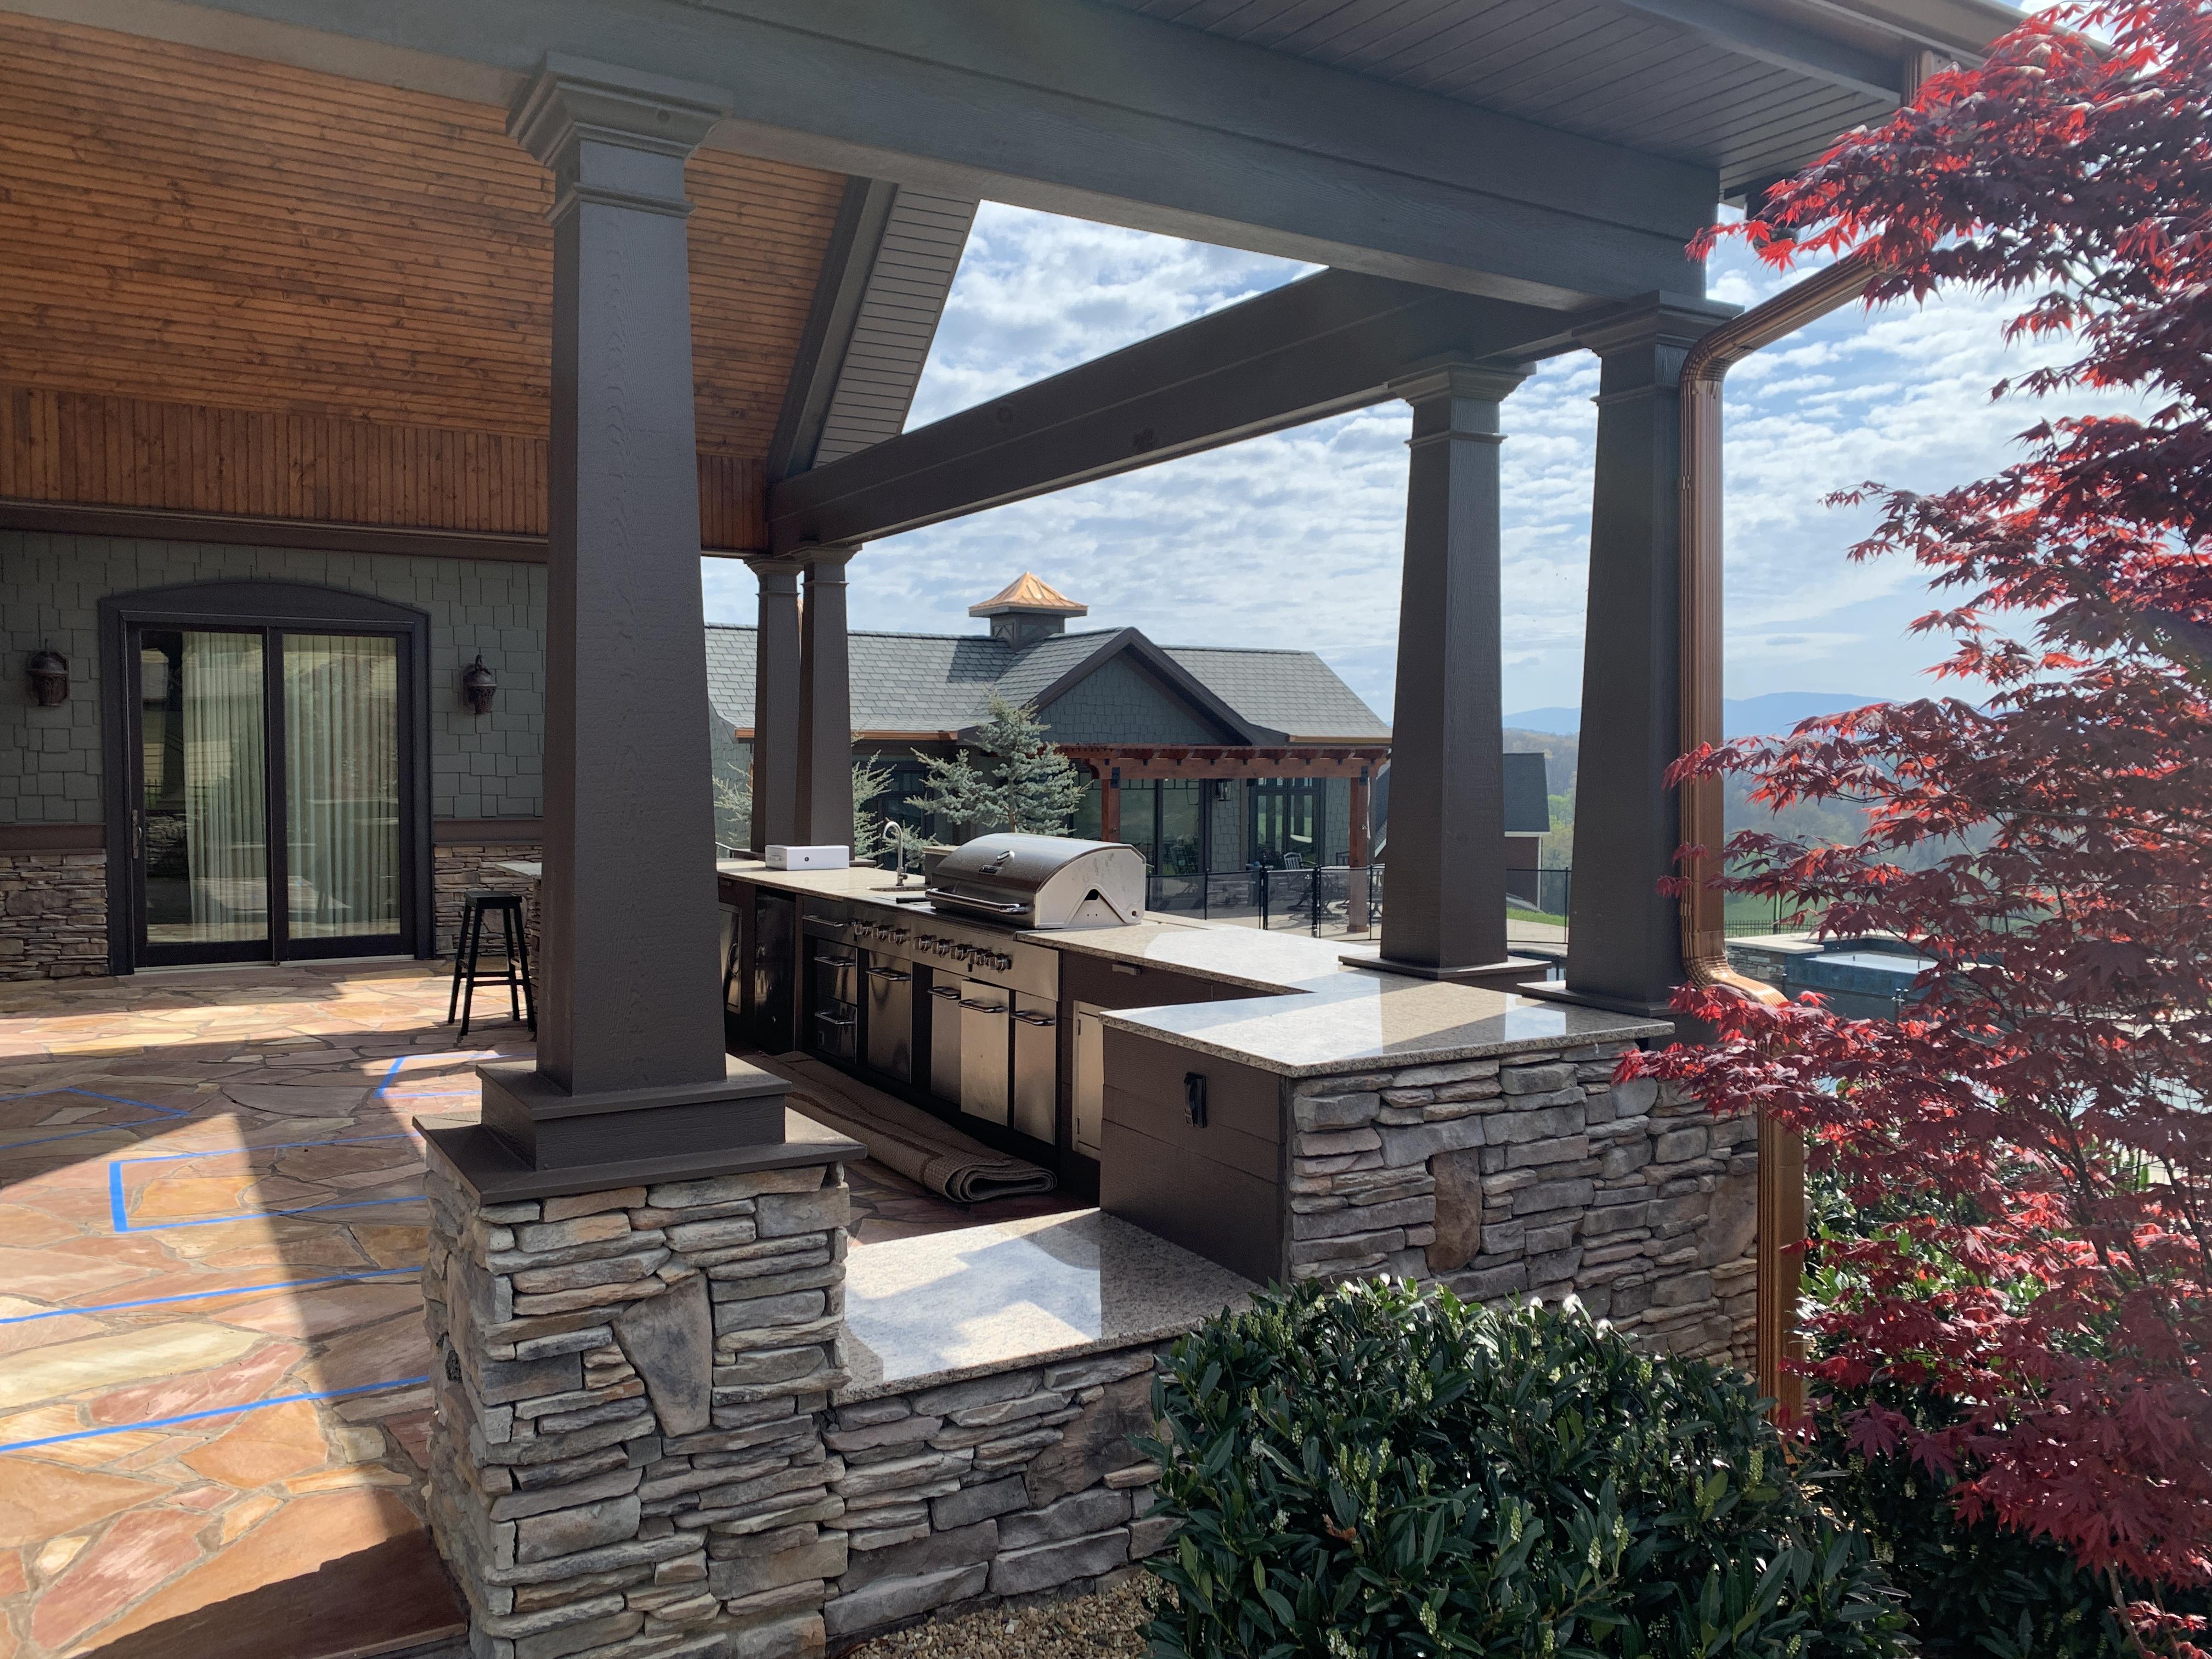 Covered Patio Ideas   Porch Enclosure Systems on Outdoor Patio Enclosure Ideas  id=14864